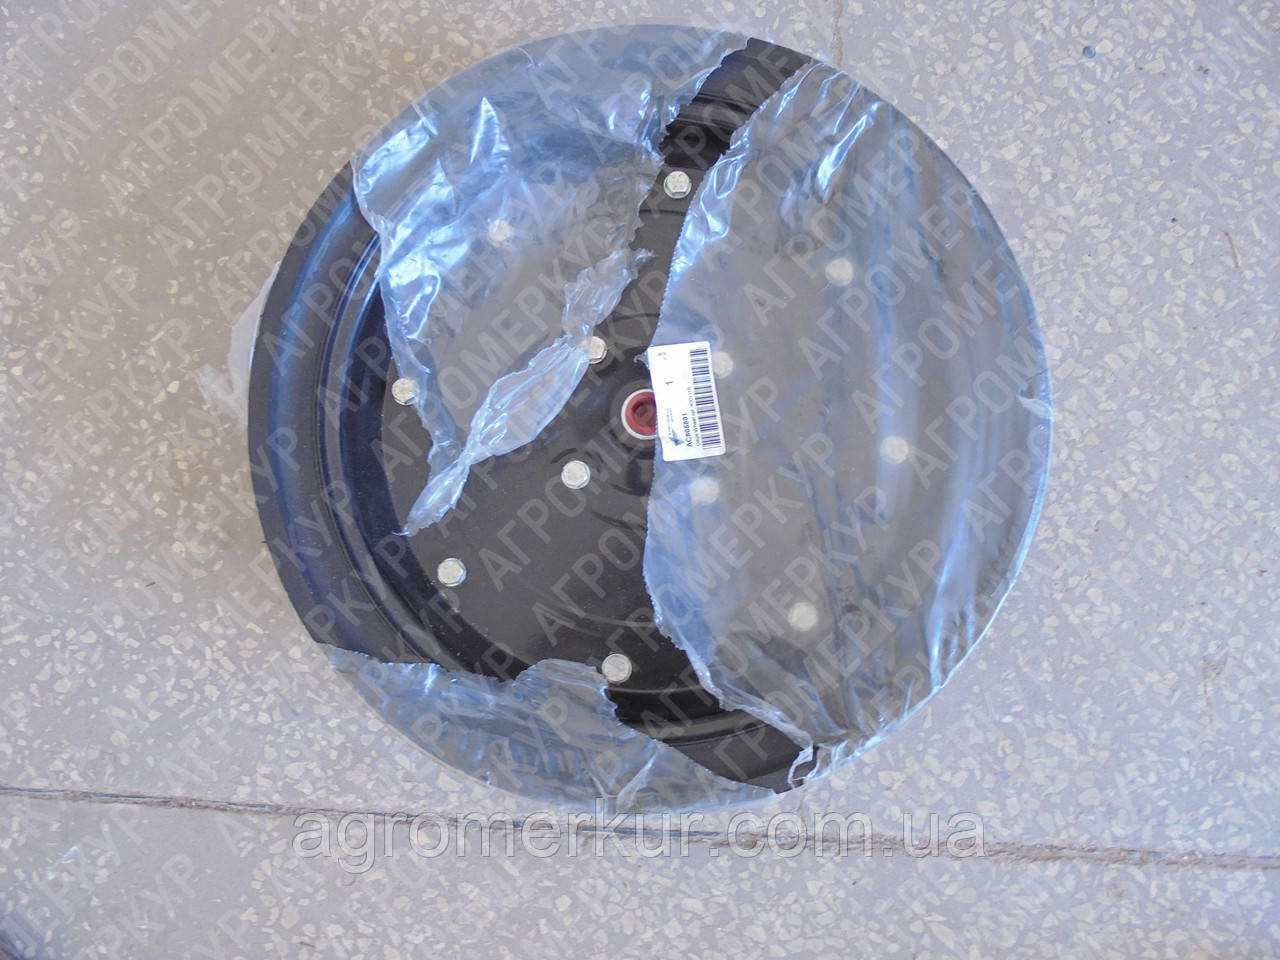 Колесо прикочуюче AC805801 Kverneland